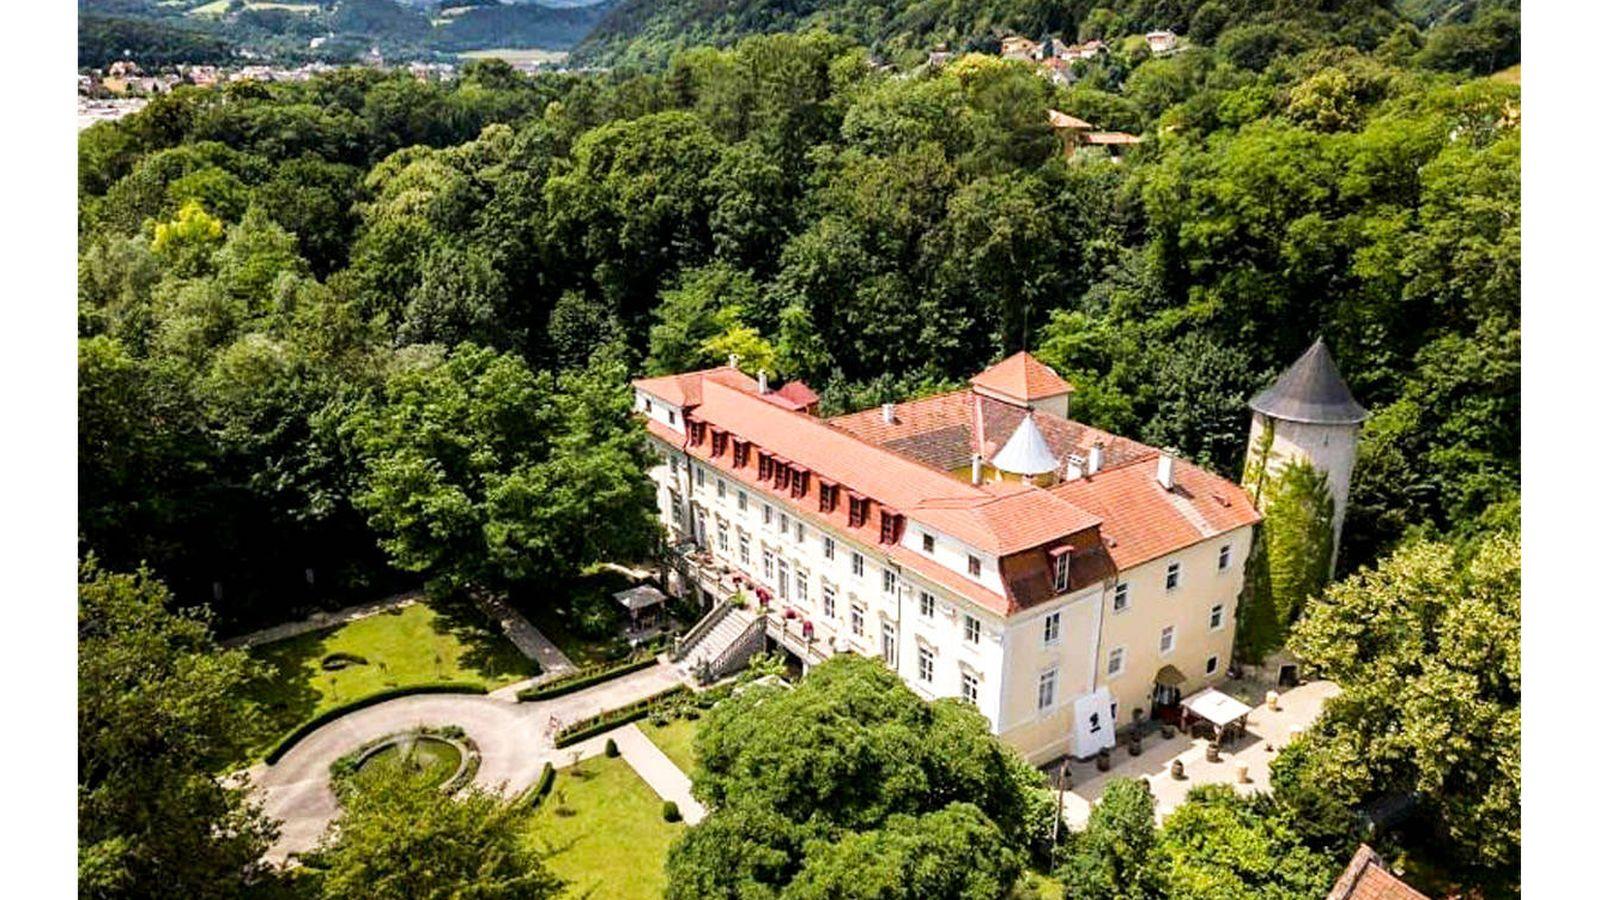 "Resultado de imagen de castillo de Stuppach"""